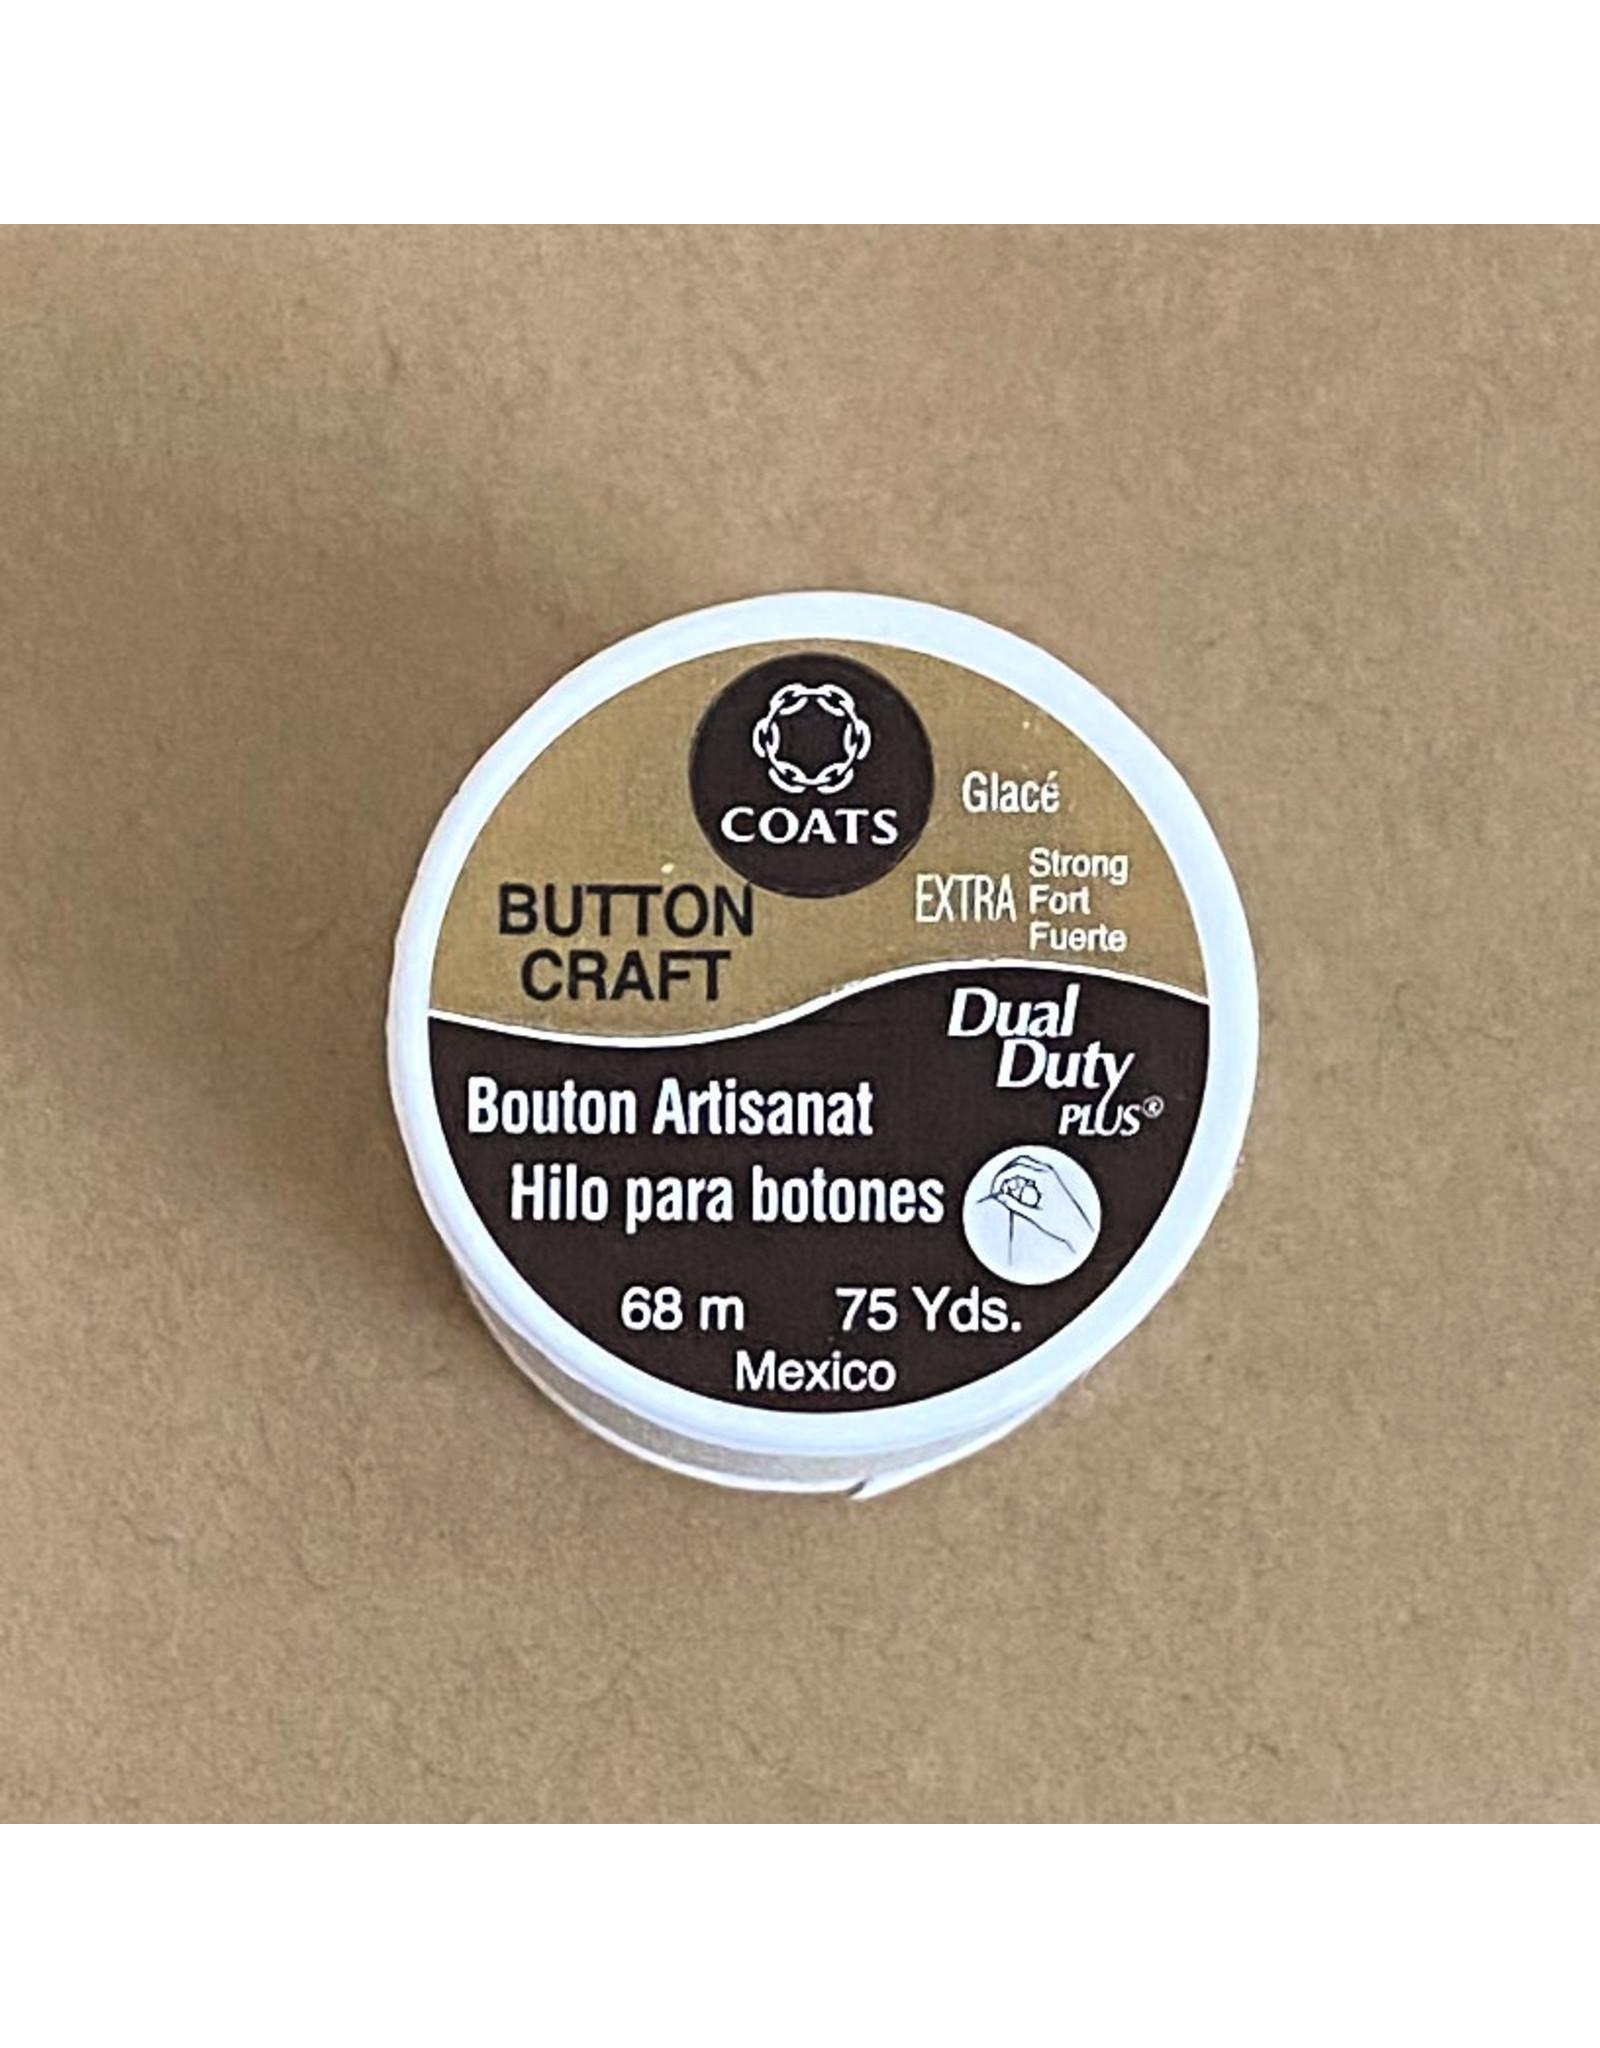 Coats & Clark Button Craft Thread, Dual Duty Plus, Color: Cream